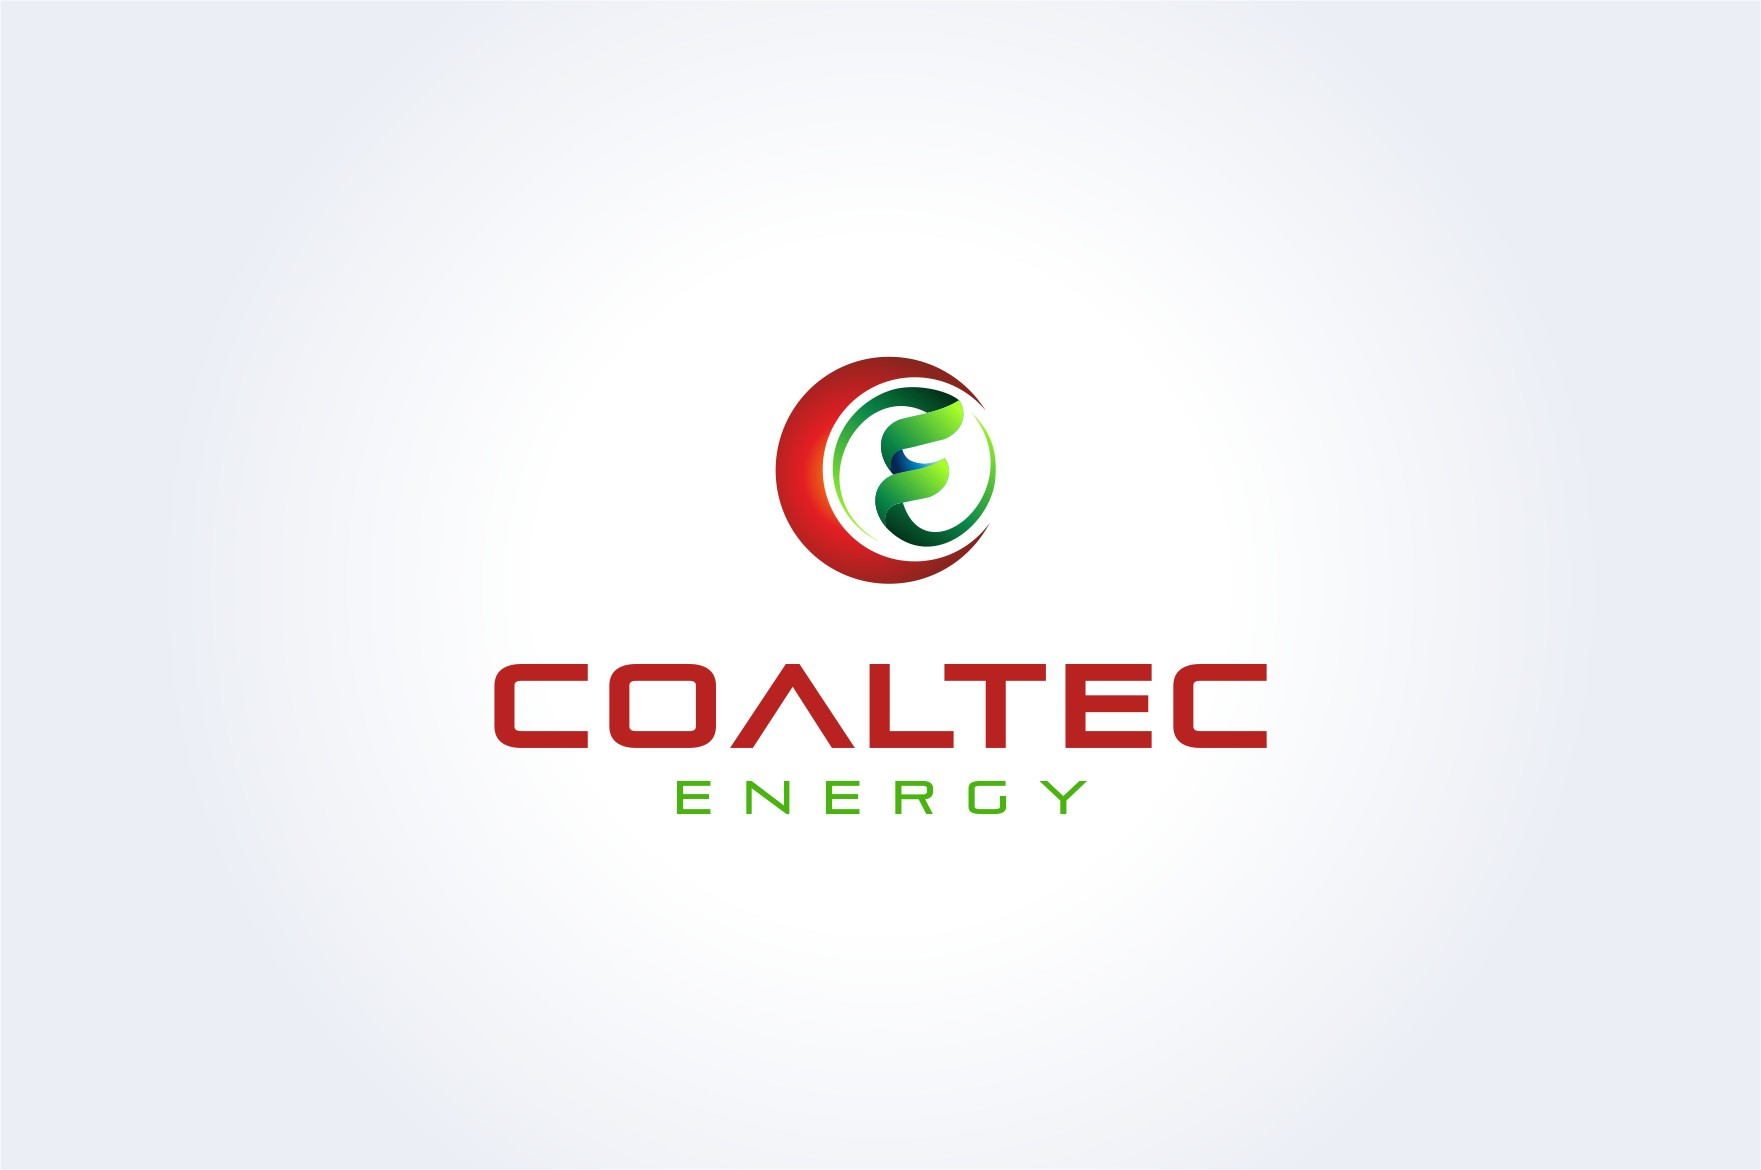 Help Coaltec Energy with a new logo